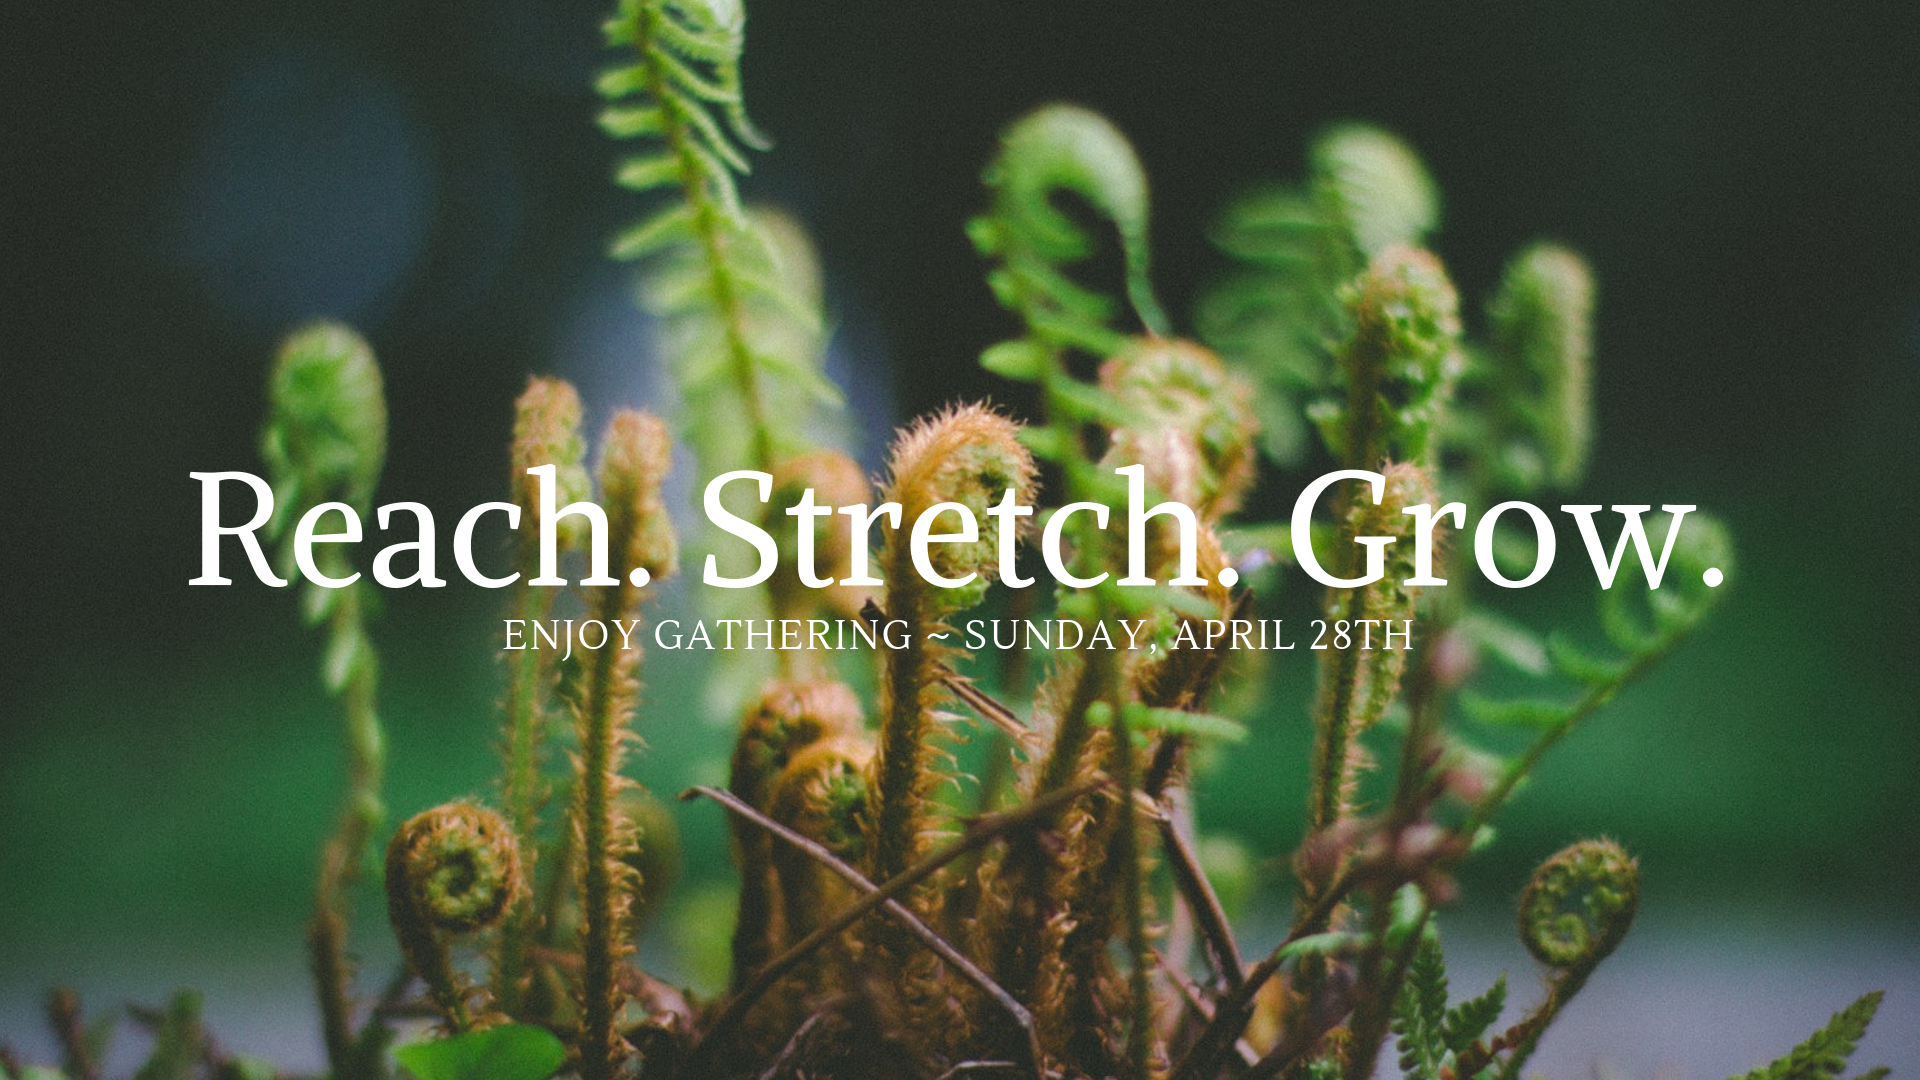 EG FBEVENT Reach. Stretch. Grow.png